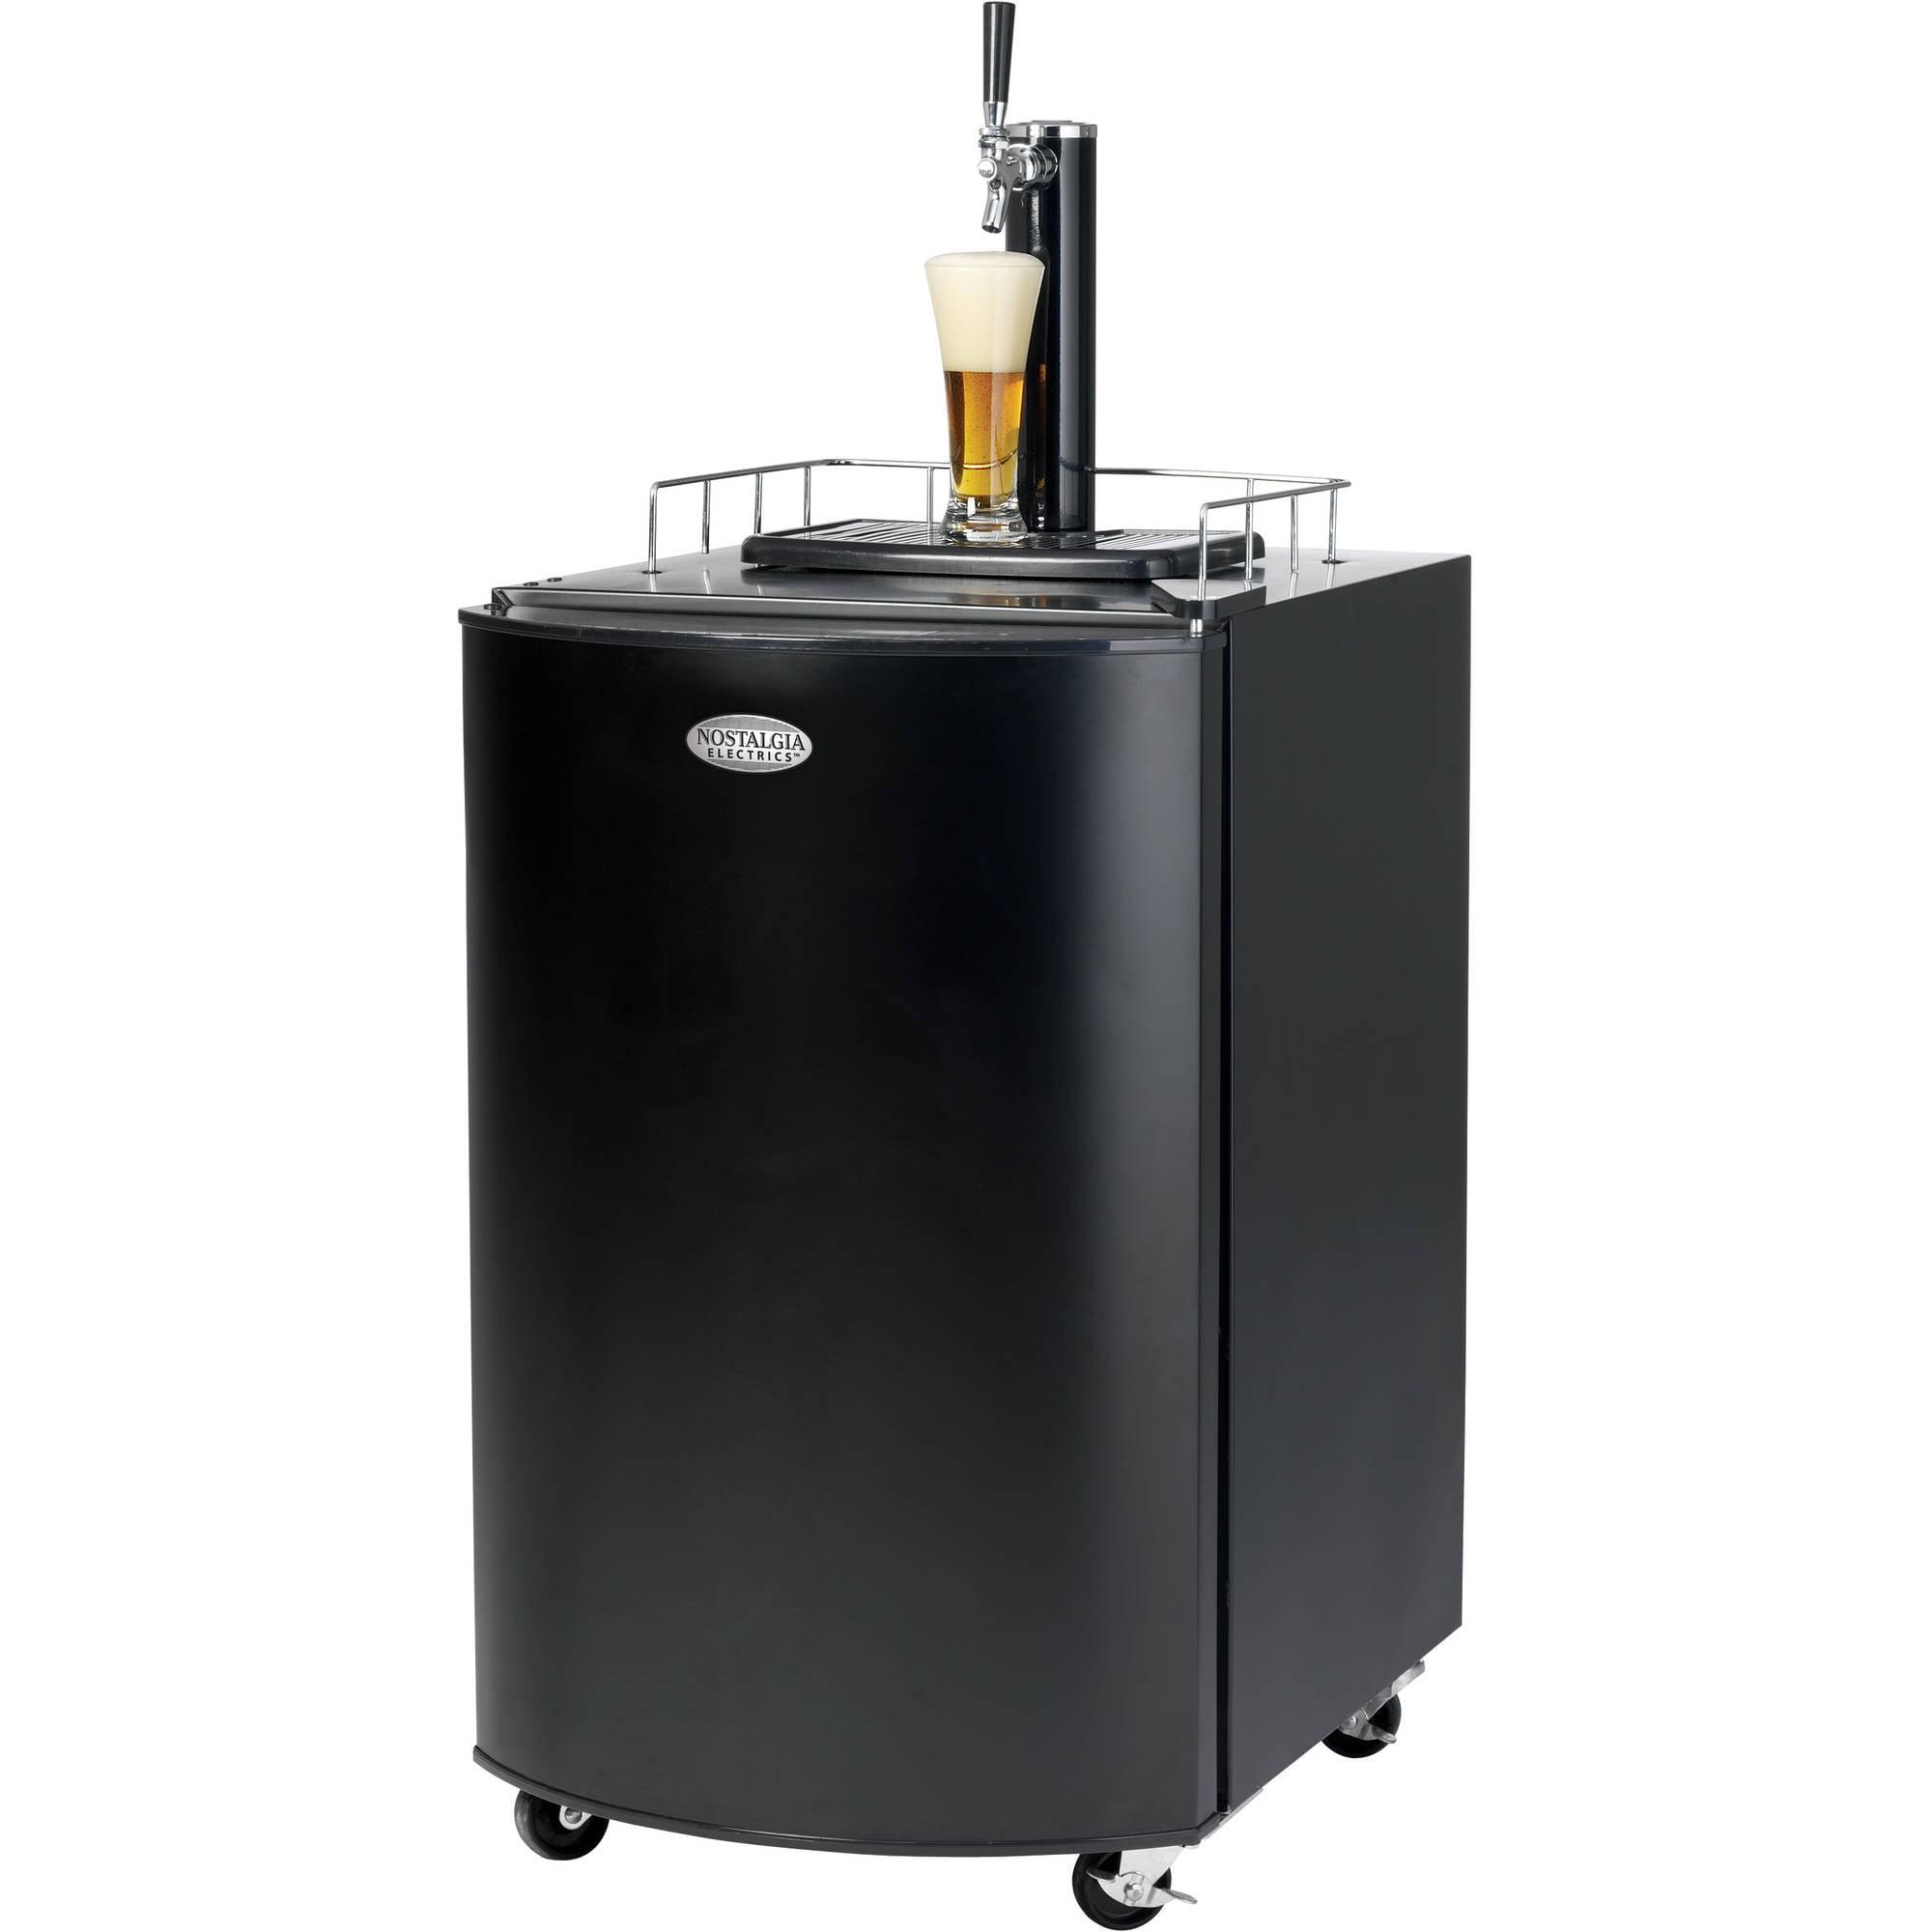 Edgestar Cbr1501sg 24 Wide 148 Can Built In Beverage Cooler With Tinted Door